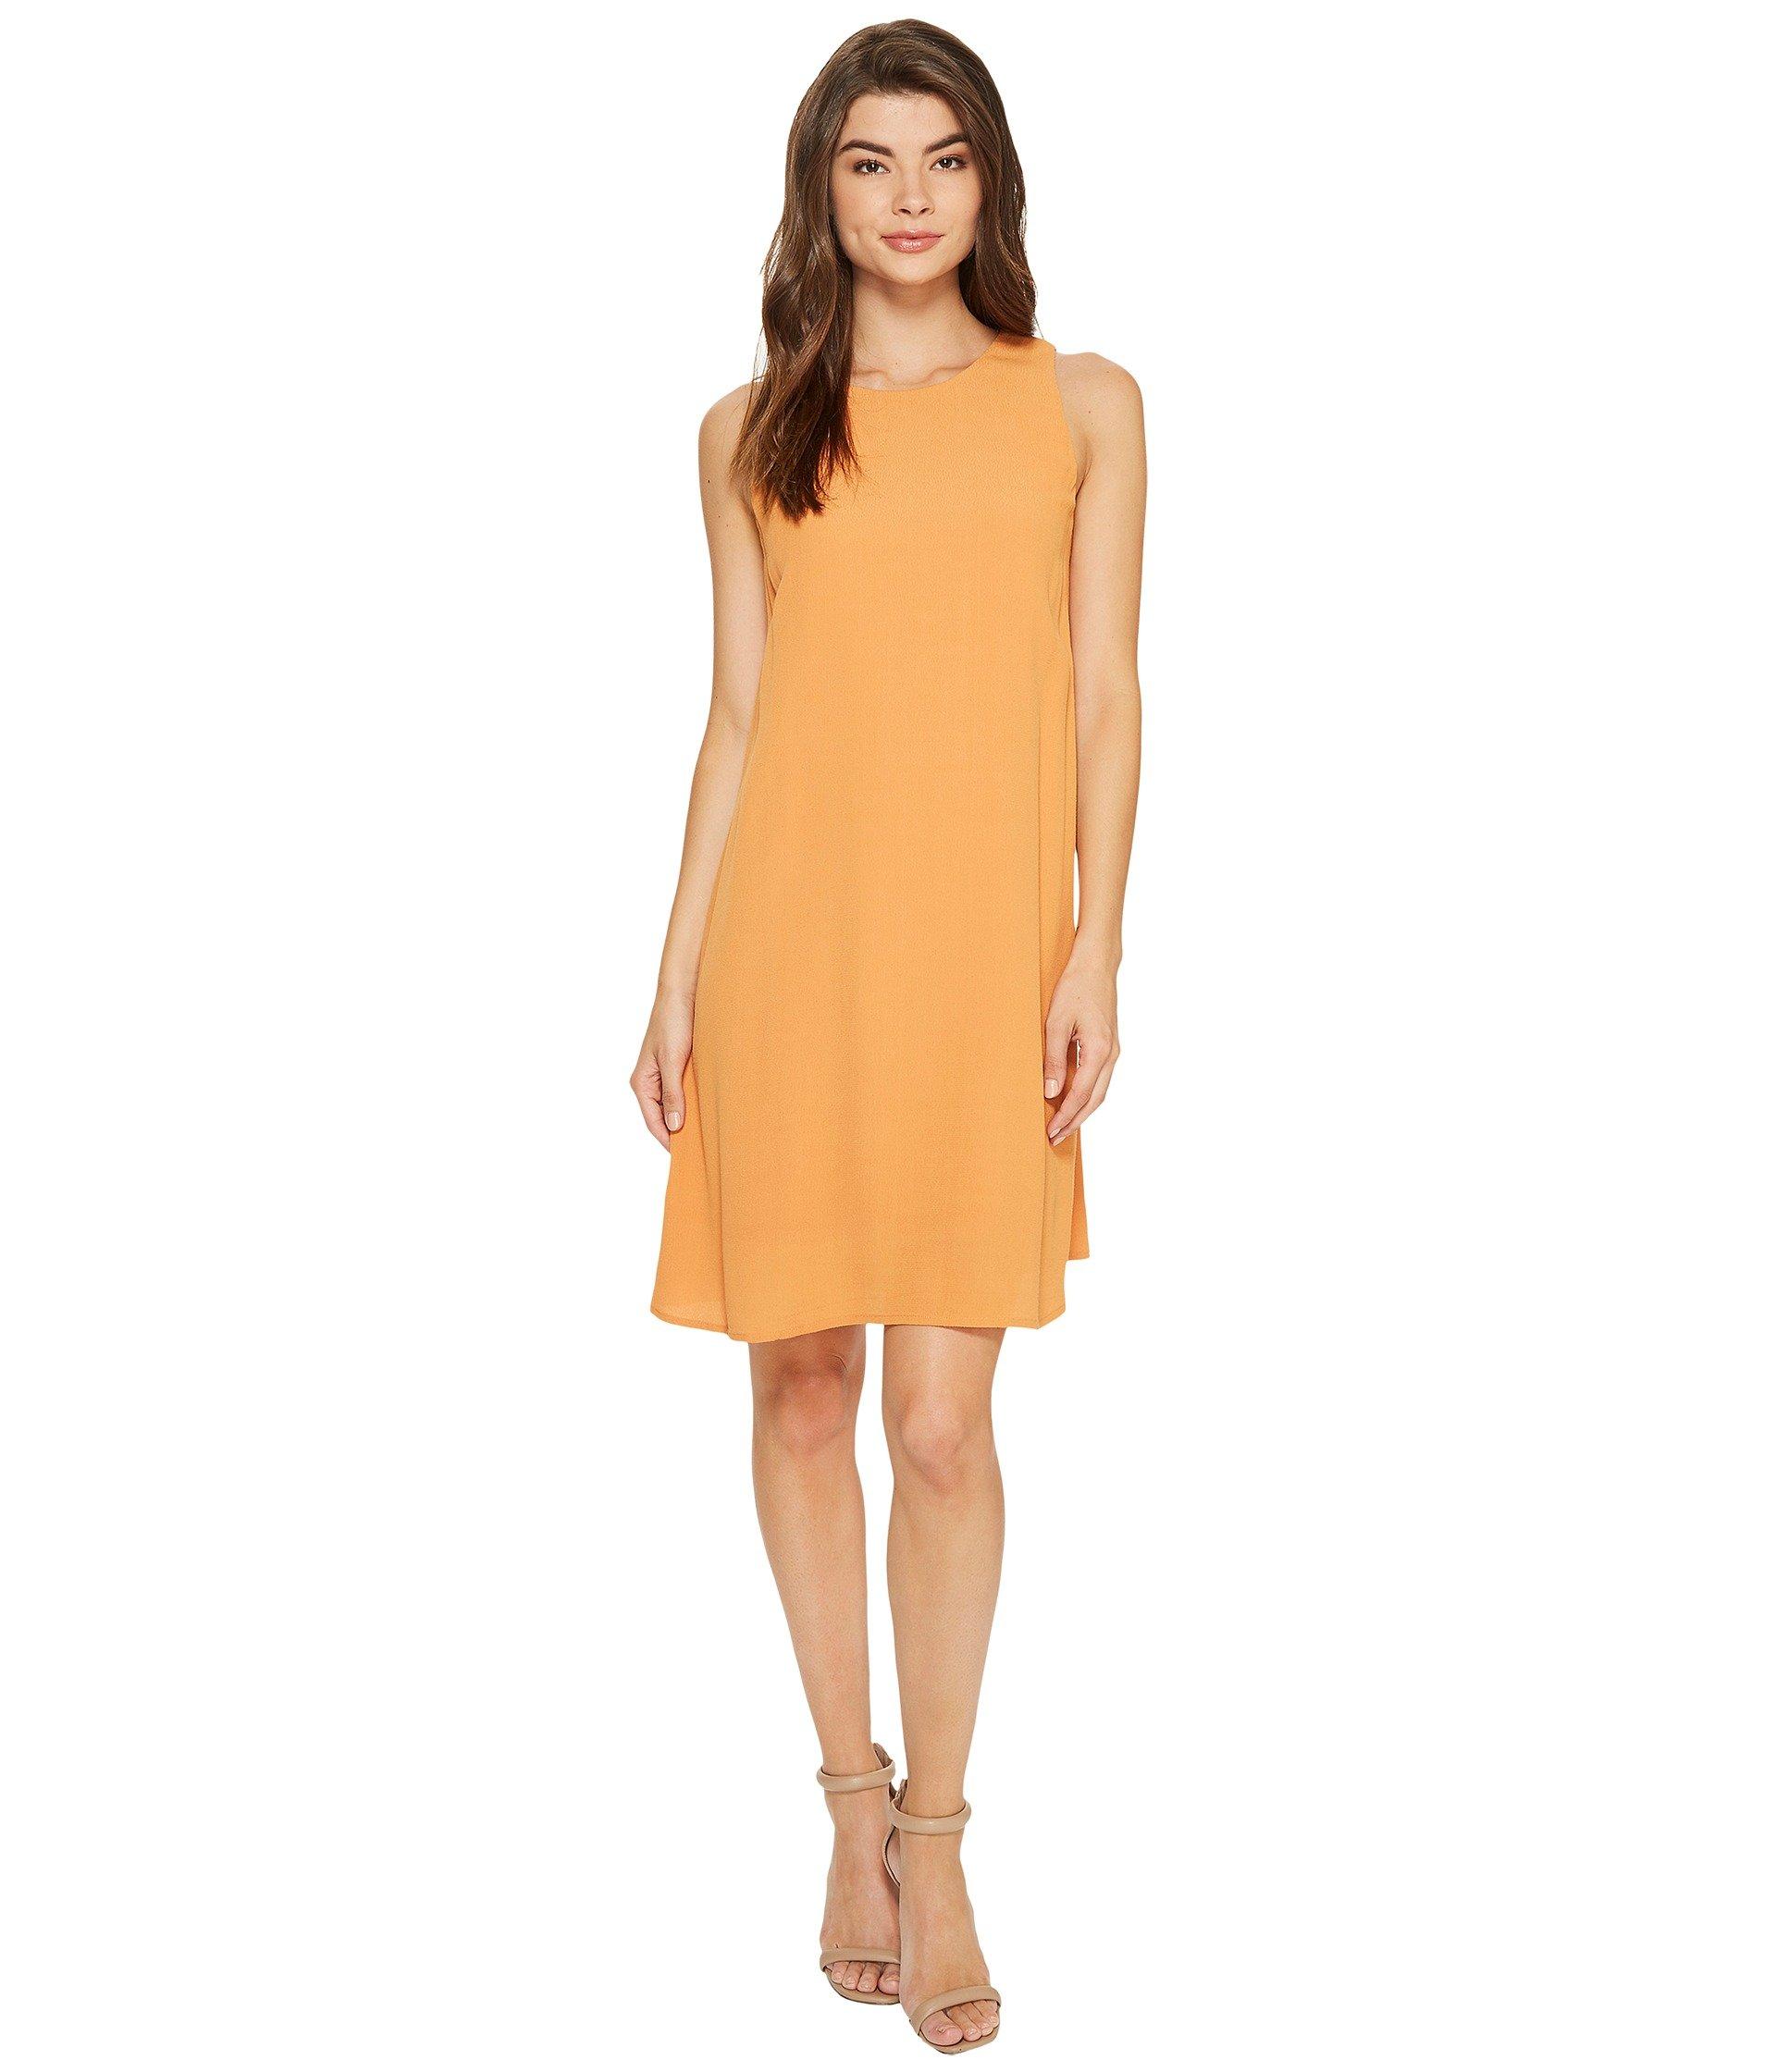 Dainty Crepe Sleeveless Dress KS7K7994